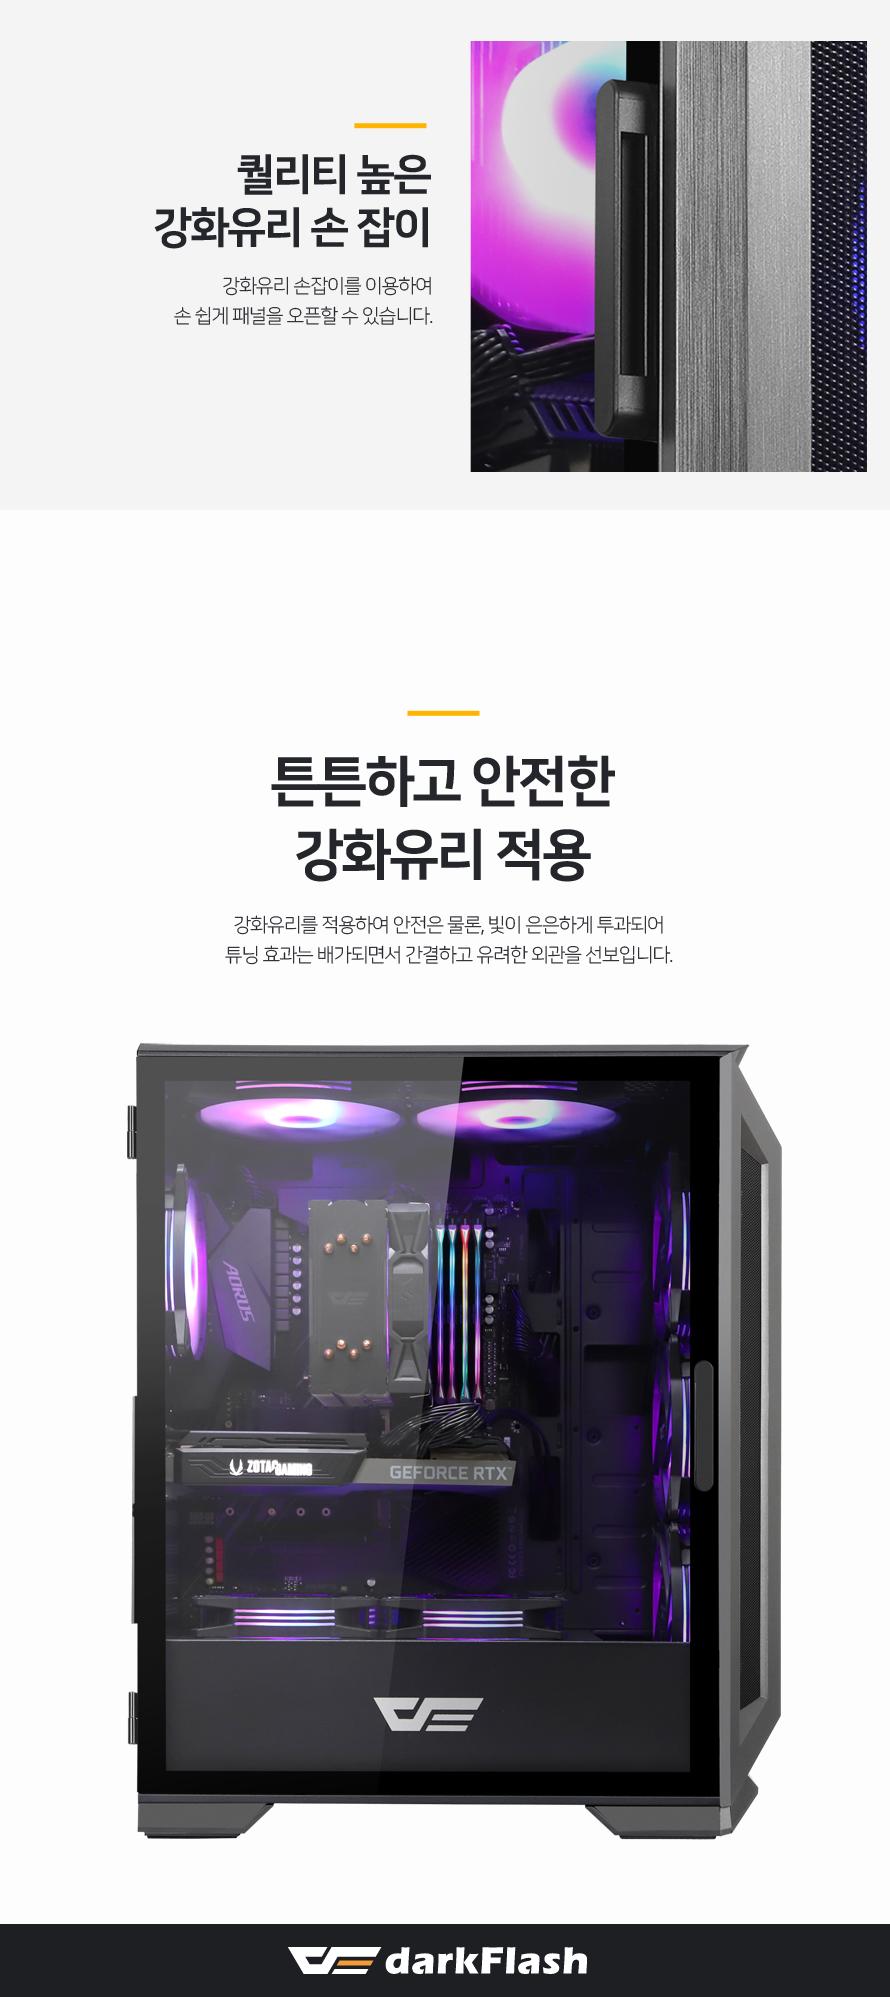 darkFlash DK510 ALPHECCA RGB 강화유리 (블랙)